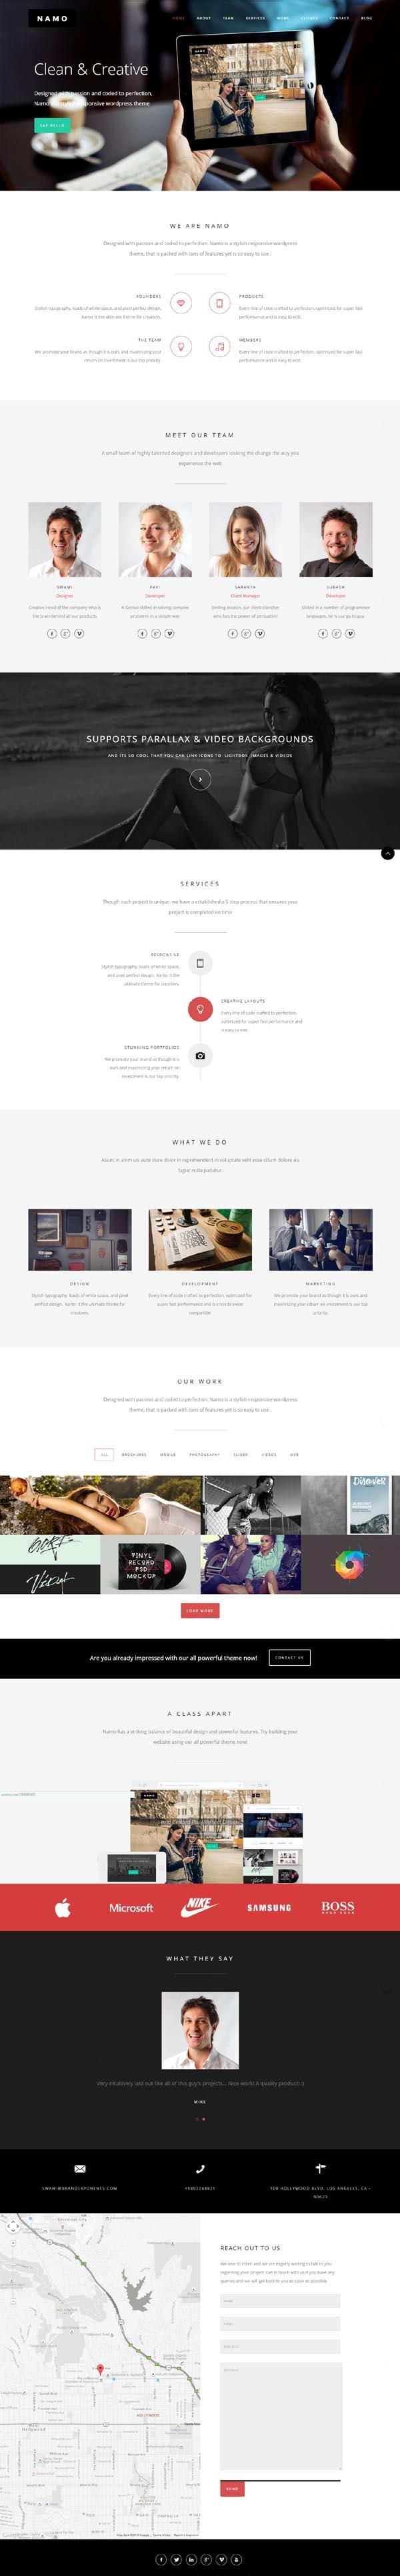 NAMO - Creative Multi-Purpose HTML5 Theme